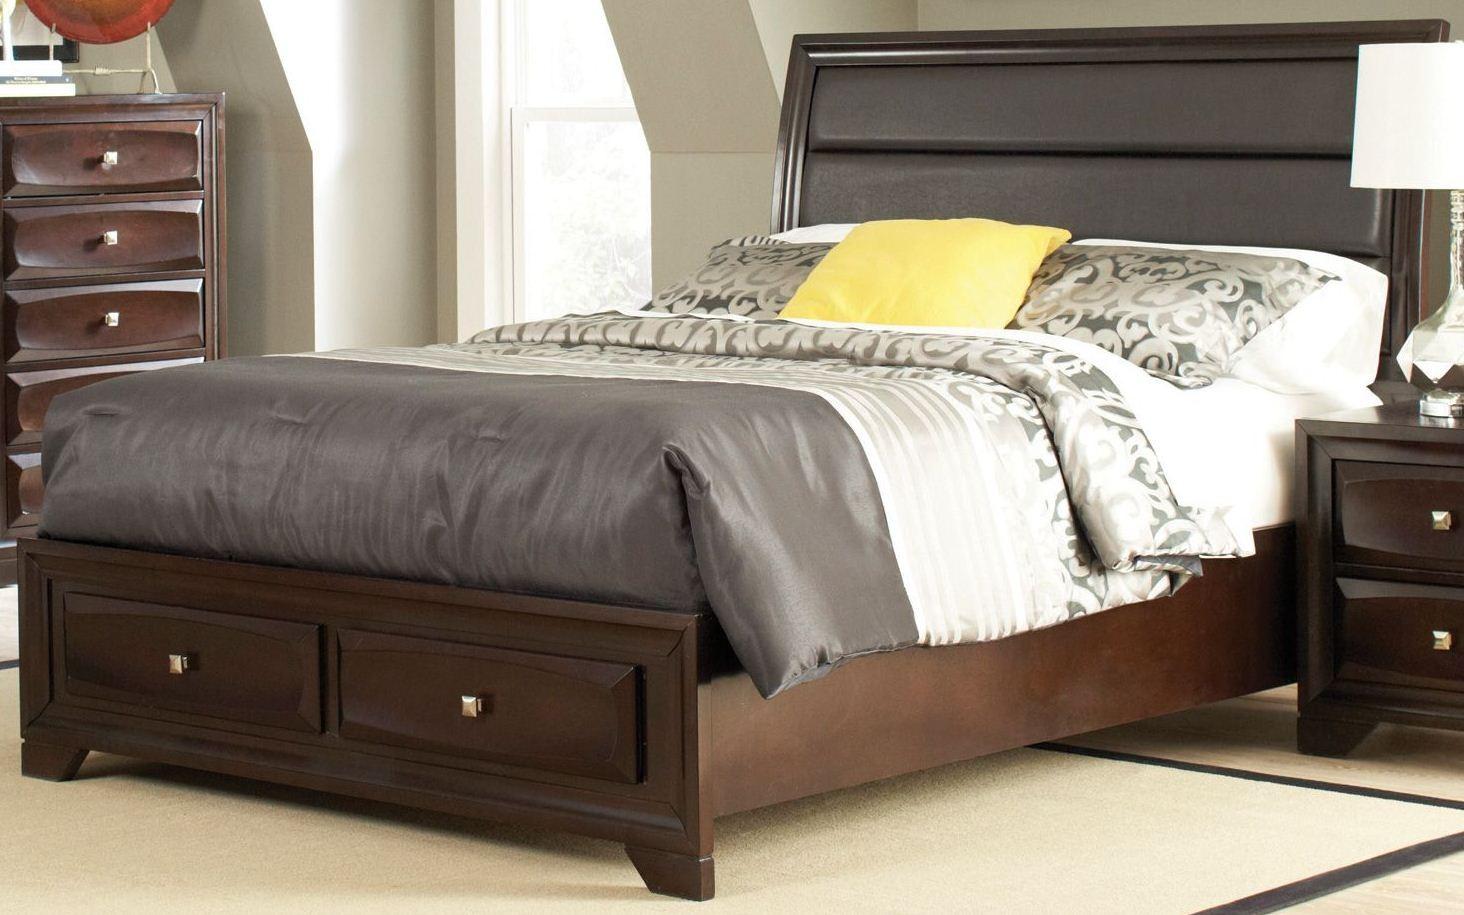 Jaxson Cal King Storage Platform Bed From Coaster